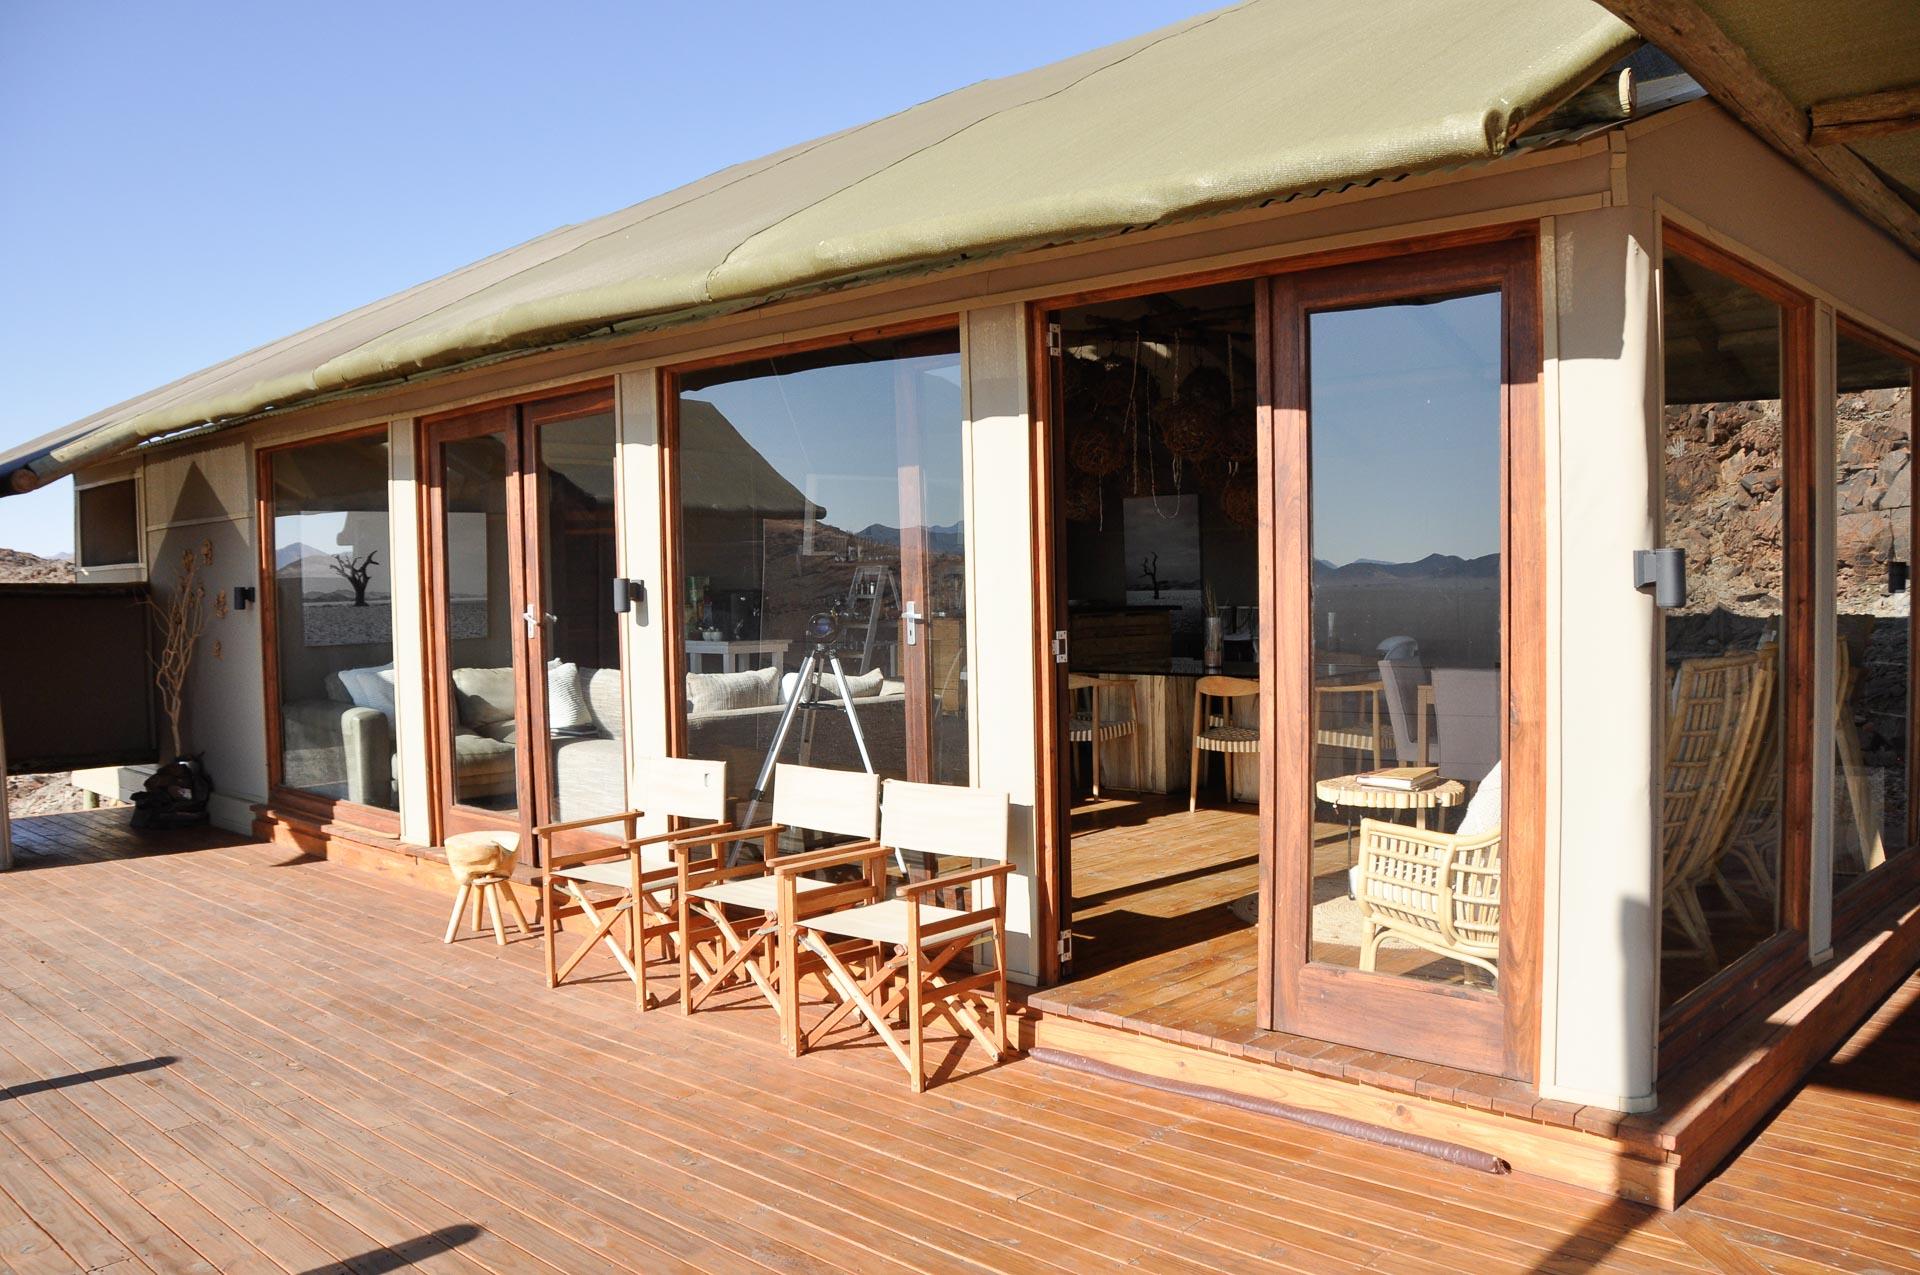 Kanaan-Desert-Retreat-Namibia-Globetrotter-Select-11